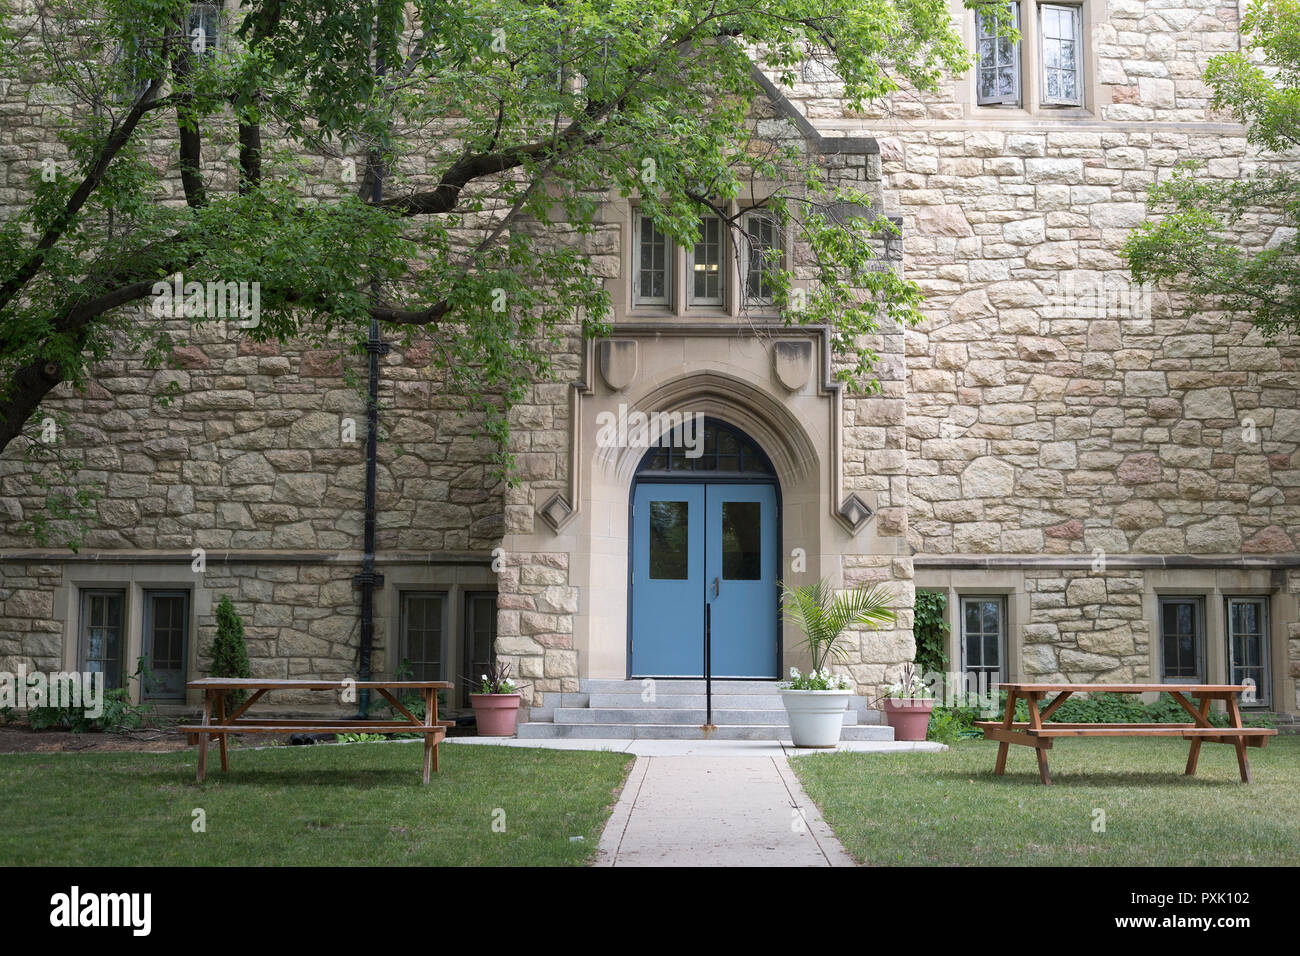 St. Andrew's College on University of Saskatchewan Campus, limestone building in Collegiate Gothic style - Stock Image